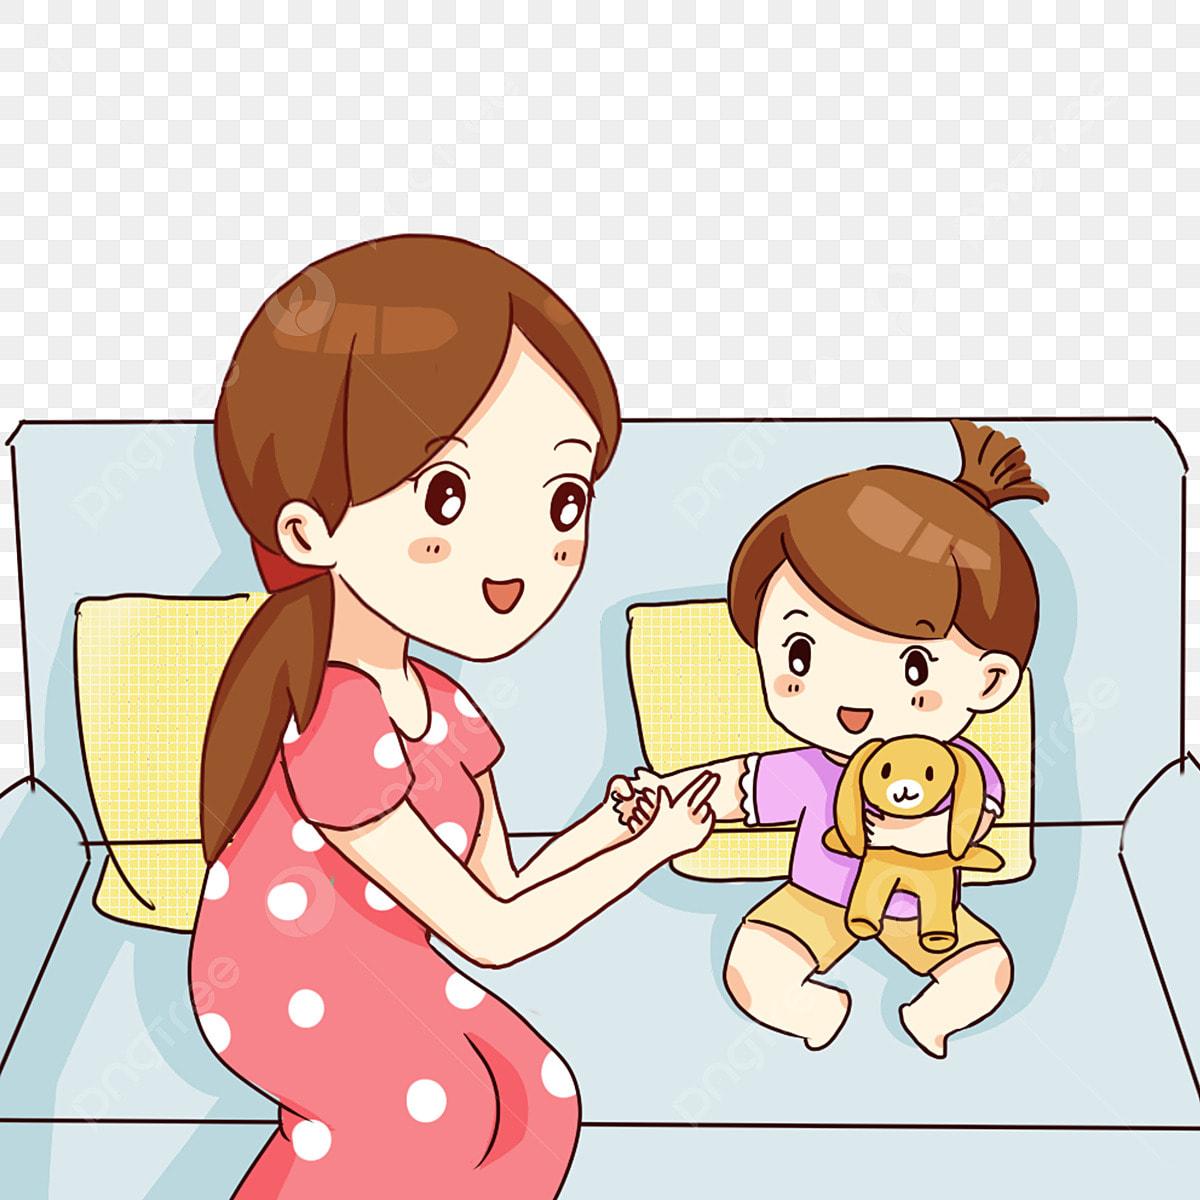 Gambar Tangan Ditarik Kartun Ibu Dan Anak Perempuan Bermain Permainan Ibu Dan Anak Perempuan Permainan Ibu Dan Anak Perempuan Bermain Games Periksa Si Bayi Badan Bayi Comel Permainan Png Dan Psd Untuk